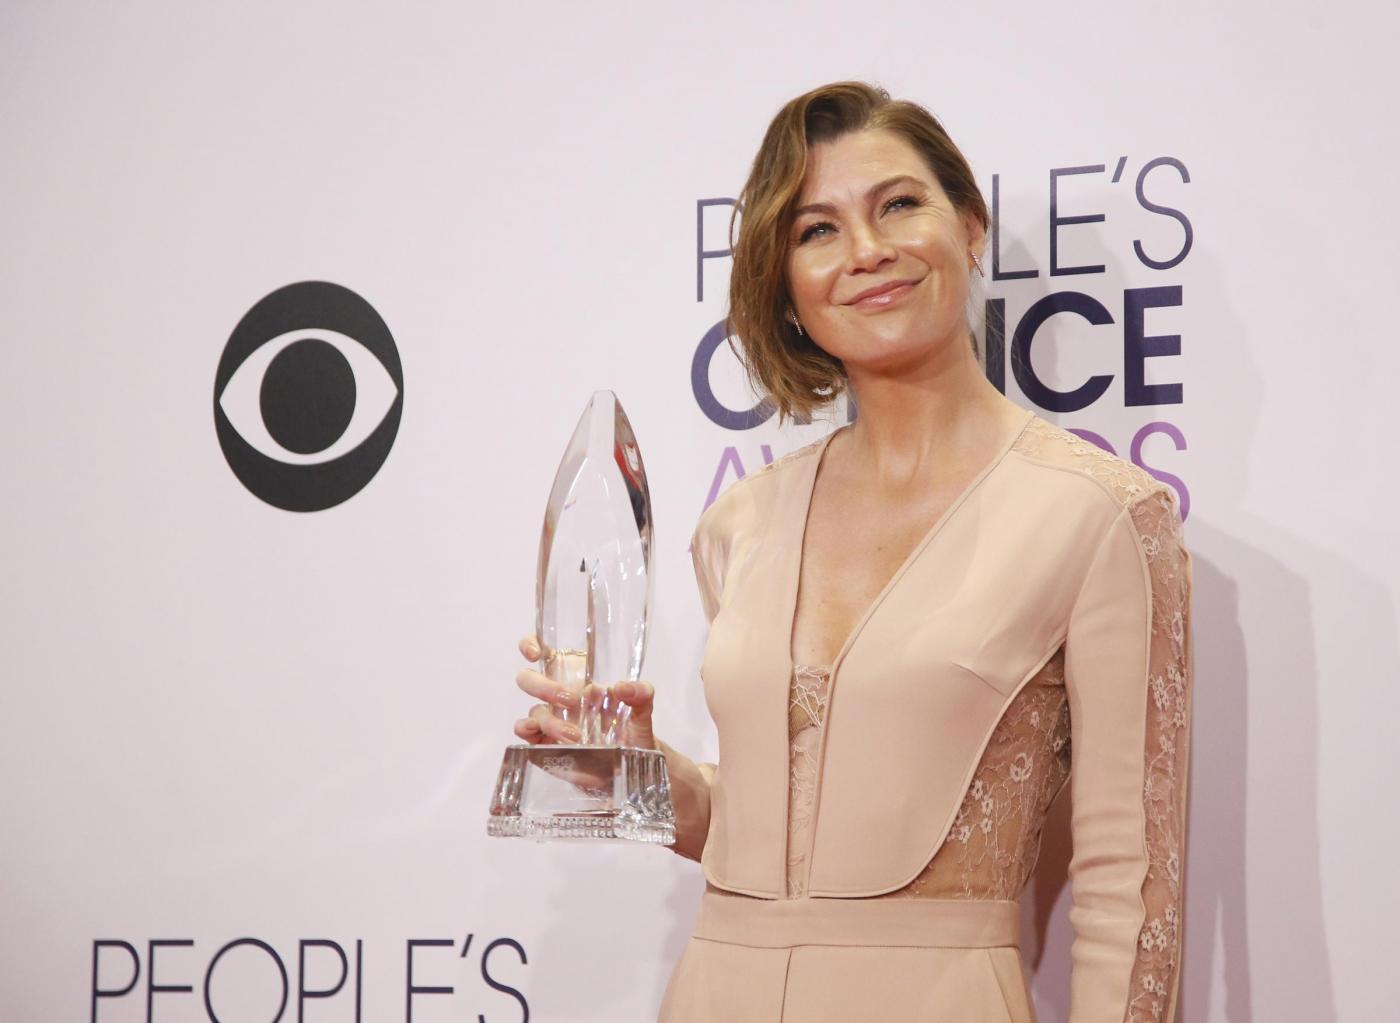 People's Choice Awards 2015 vincitori